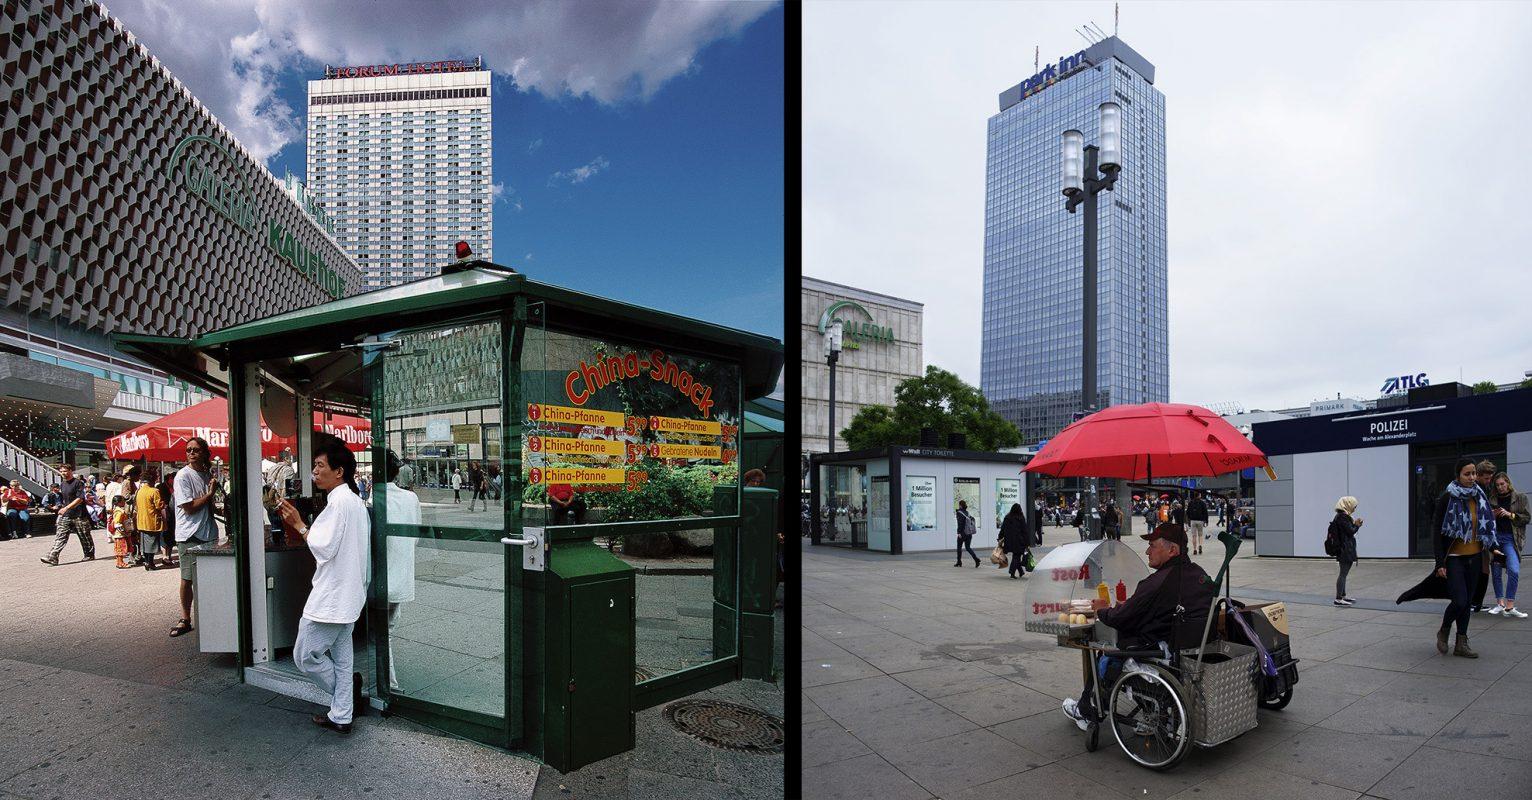 Berlin, Alexanderplatz, Chinaimbiss, Bratwurstverkäufer, Polizei, Galeria Kaufhof